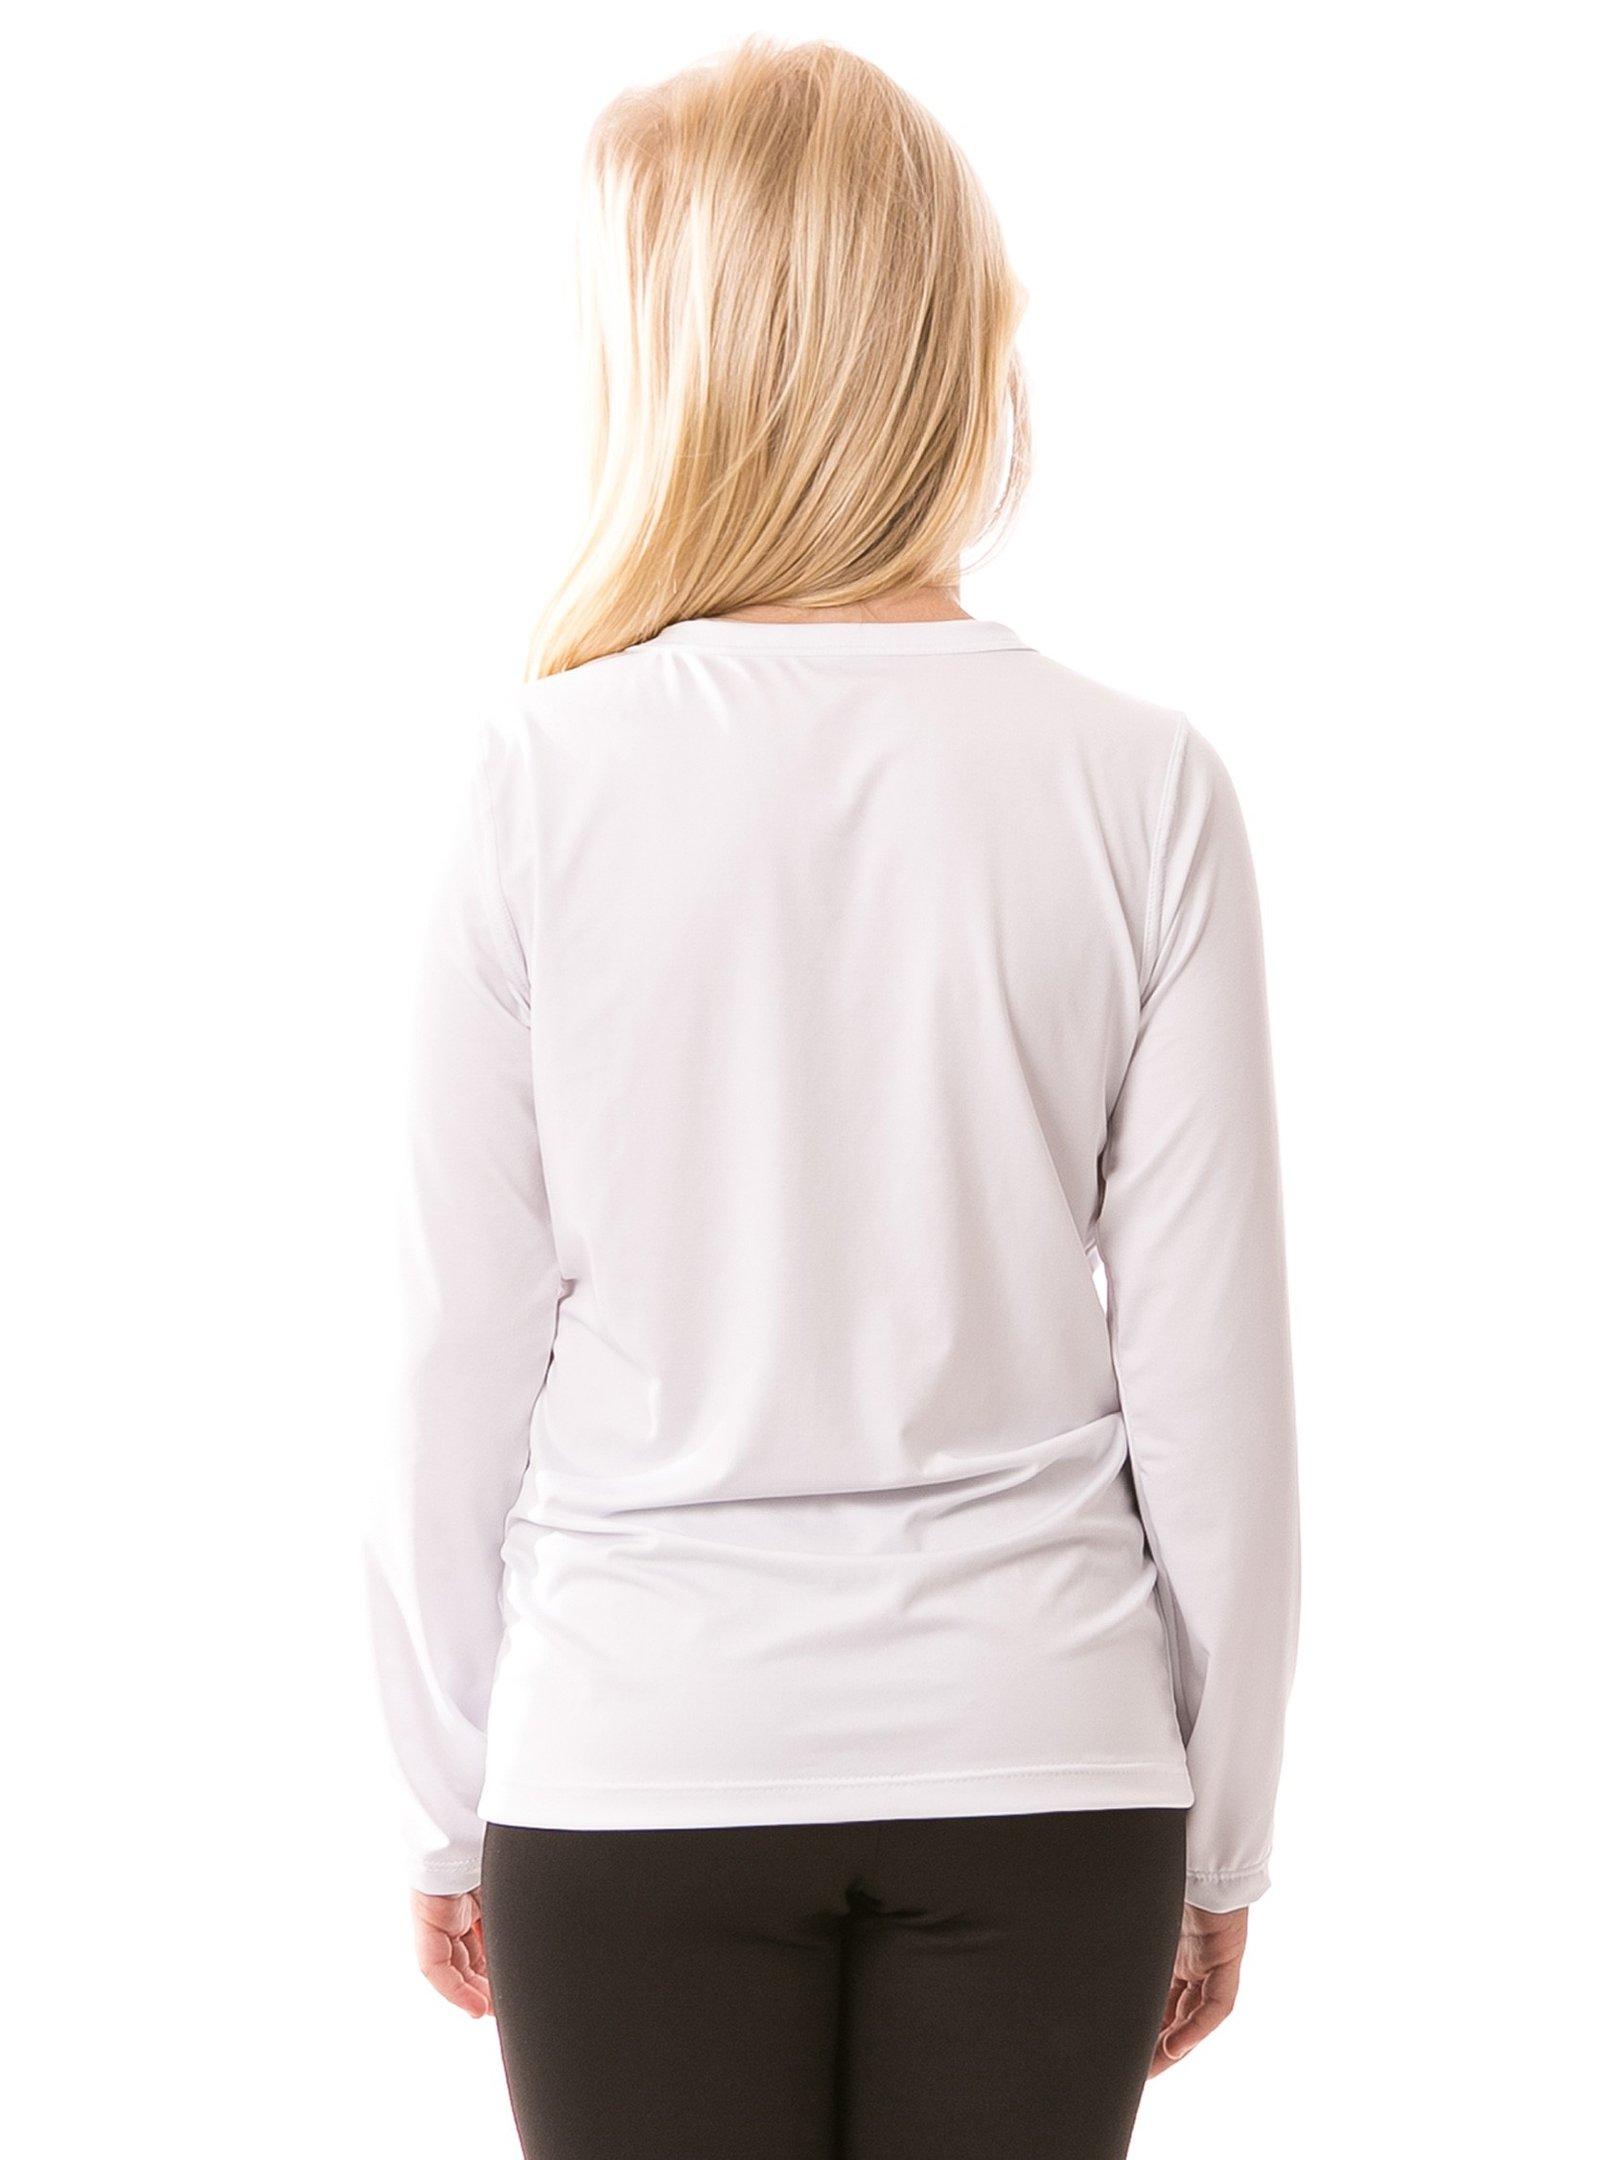 feminina infantil t shirt longa ice branca costas b